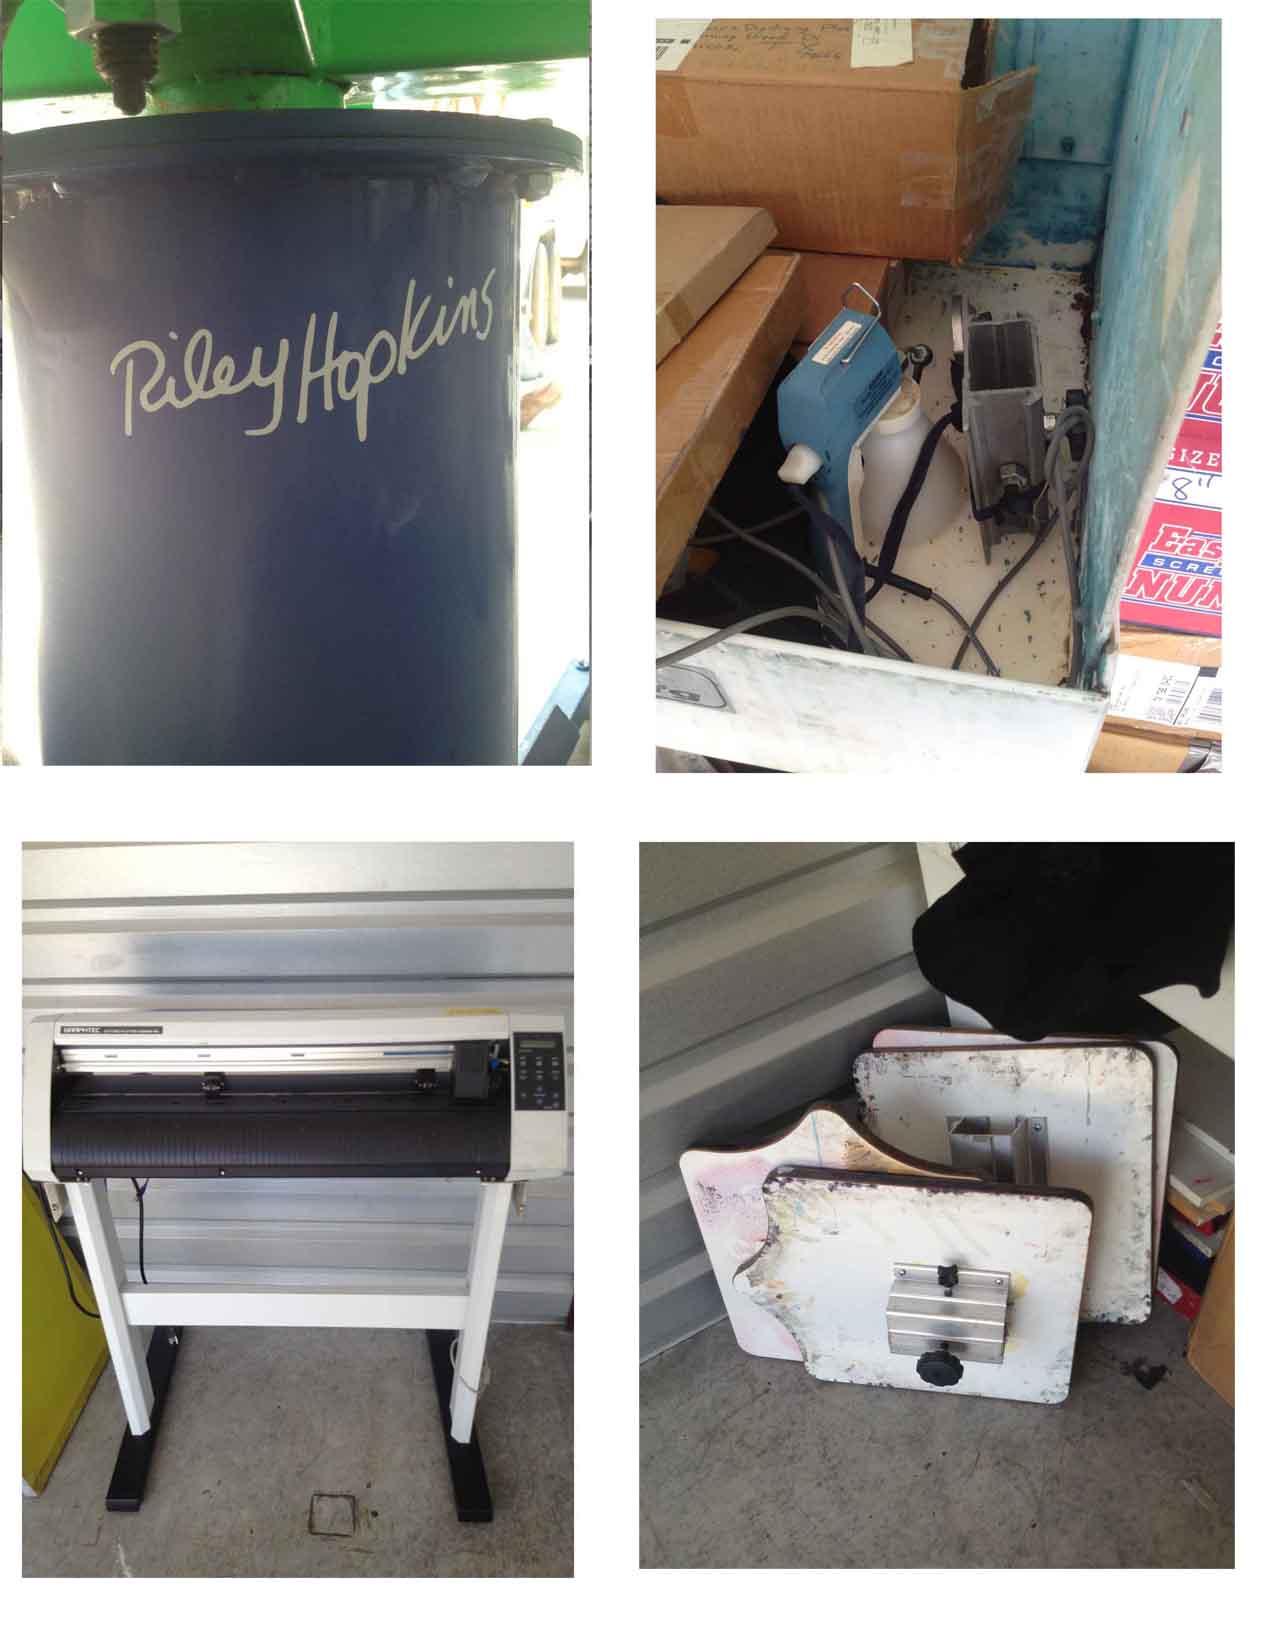 Complete studio set t shirt printing equipment for T shirt printing supplies wholesale